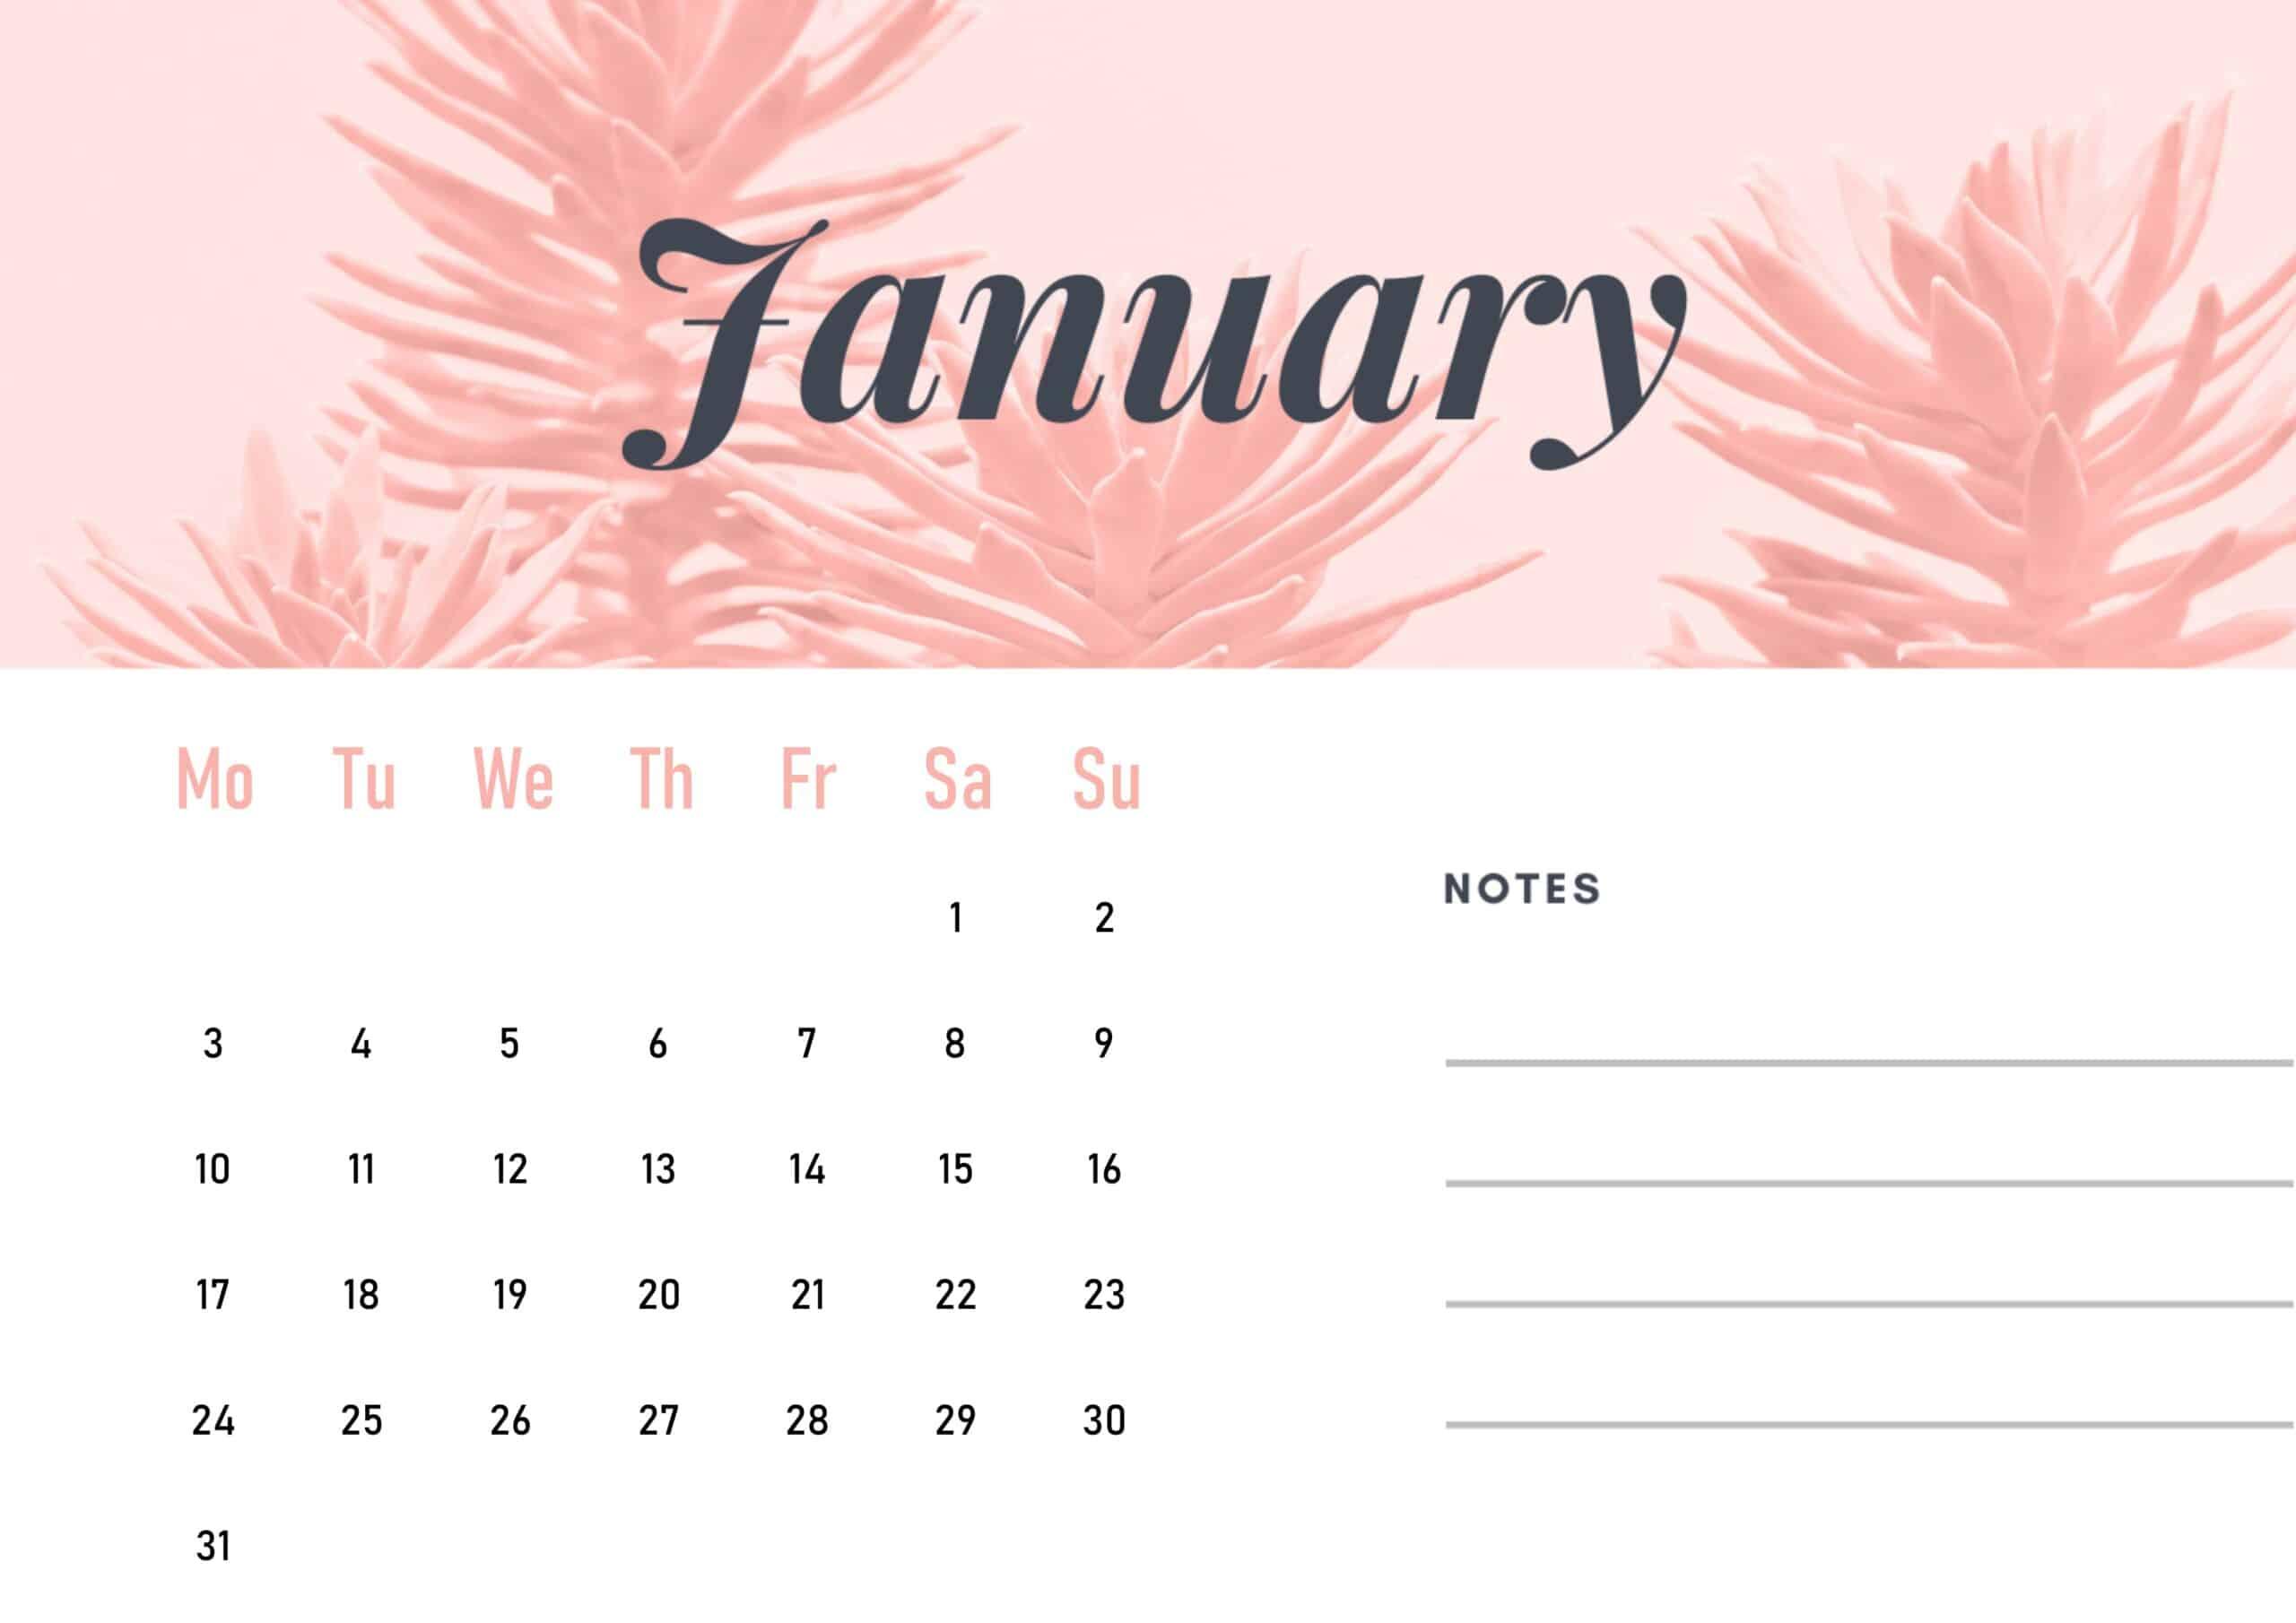 Cute January 2022 Calendar Wallpaper download